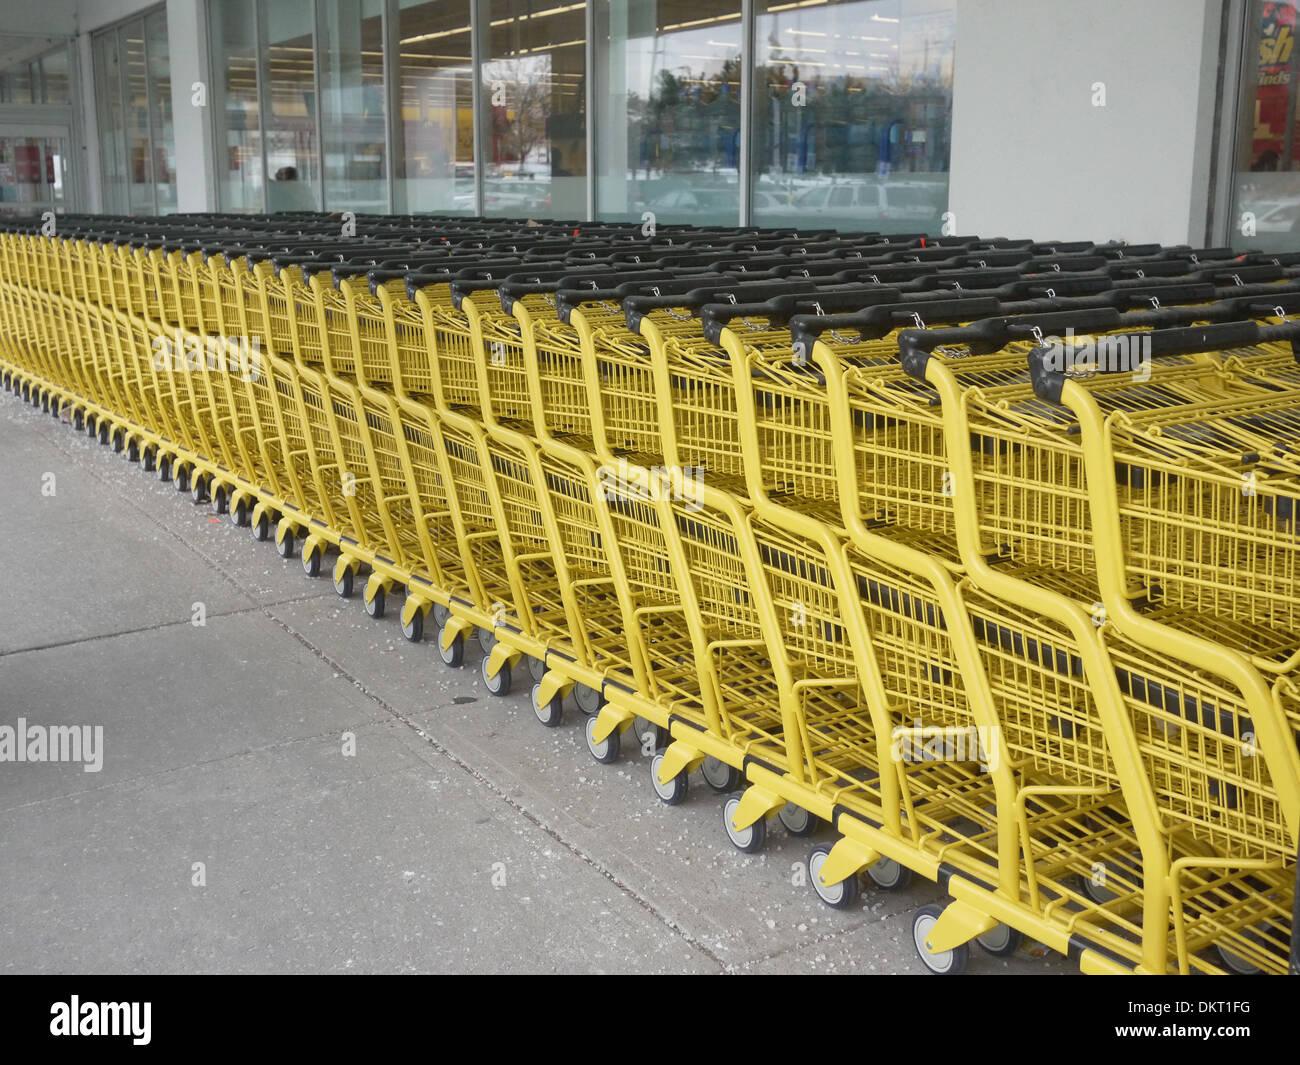 supermarket trolley - Stock Image